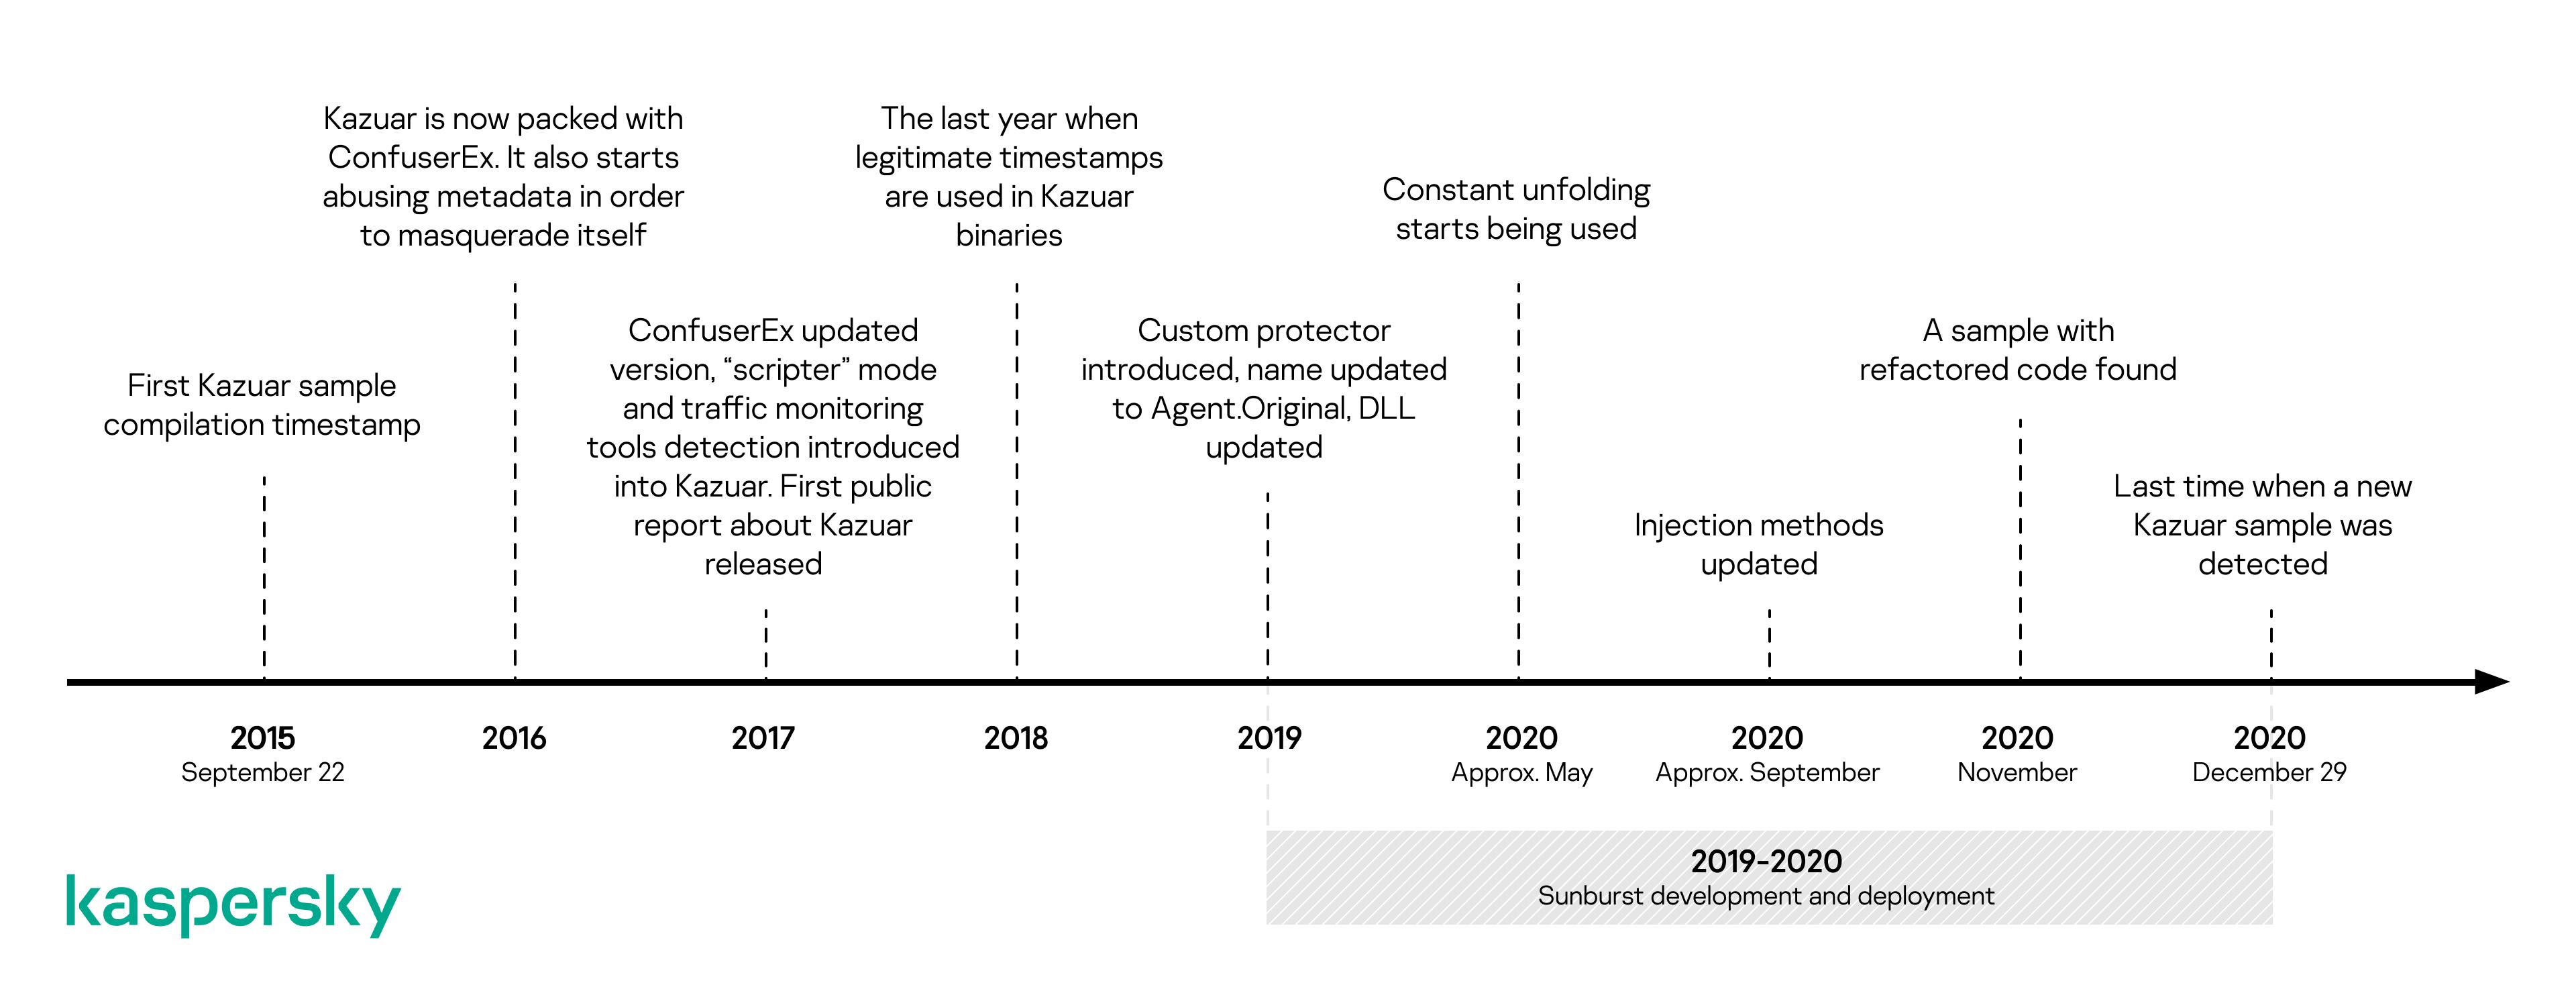 IT threat evolution Q1 2021